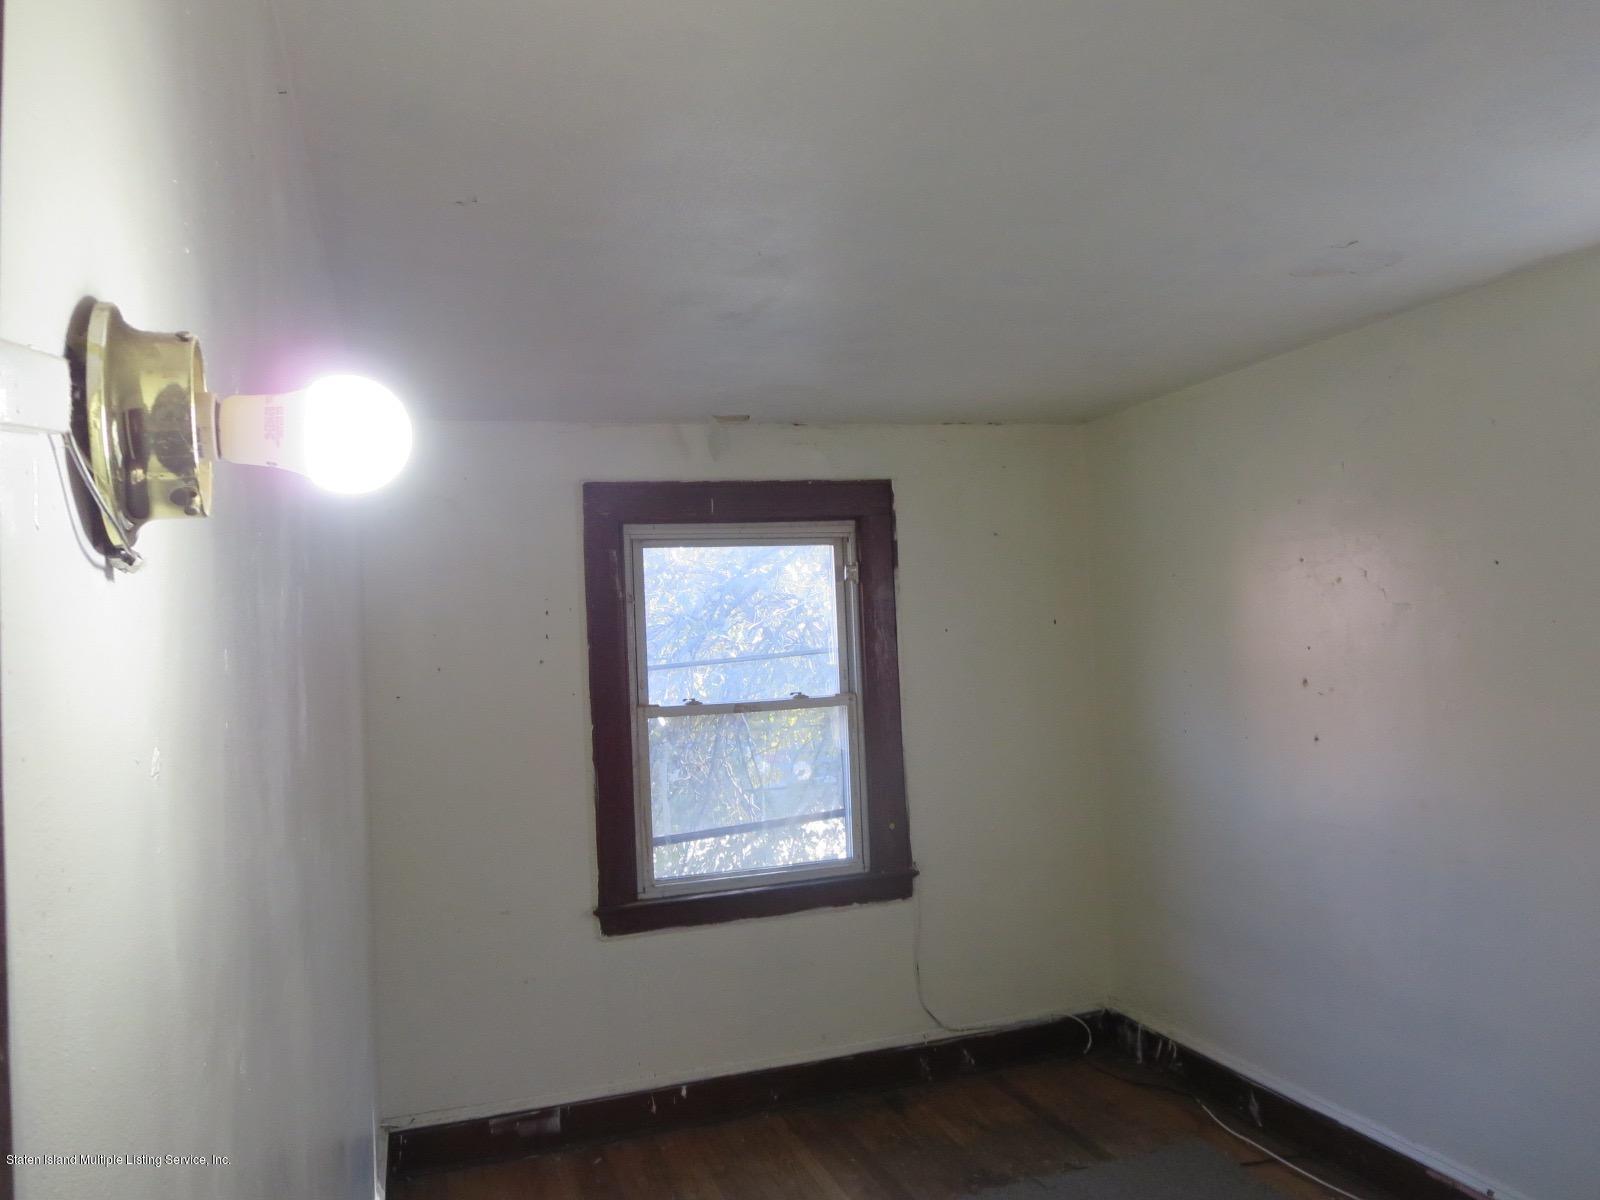 19 Bowen Street,Staten Island,New York,10304,United States,3 Bedrooms Bedrooms,6 Rooms Rooms,2 BathroomsBathrooms,Residential,Bowen,1135147